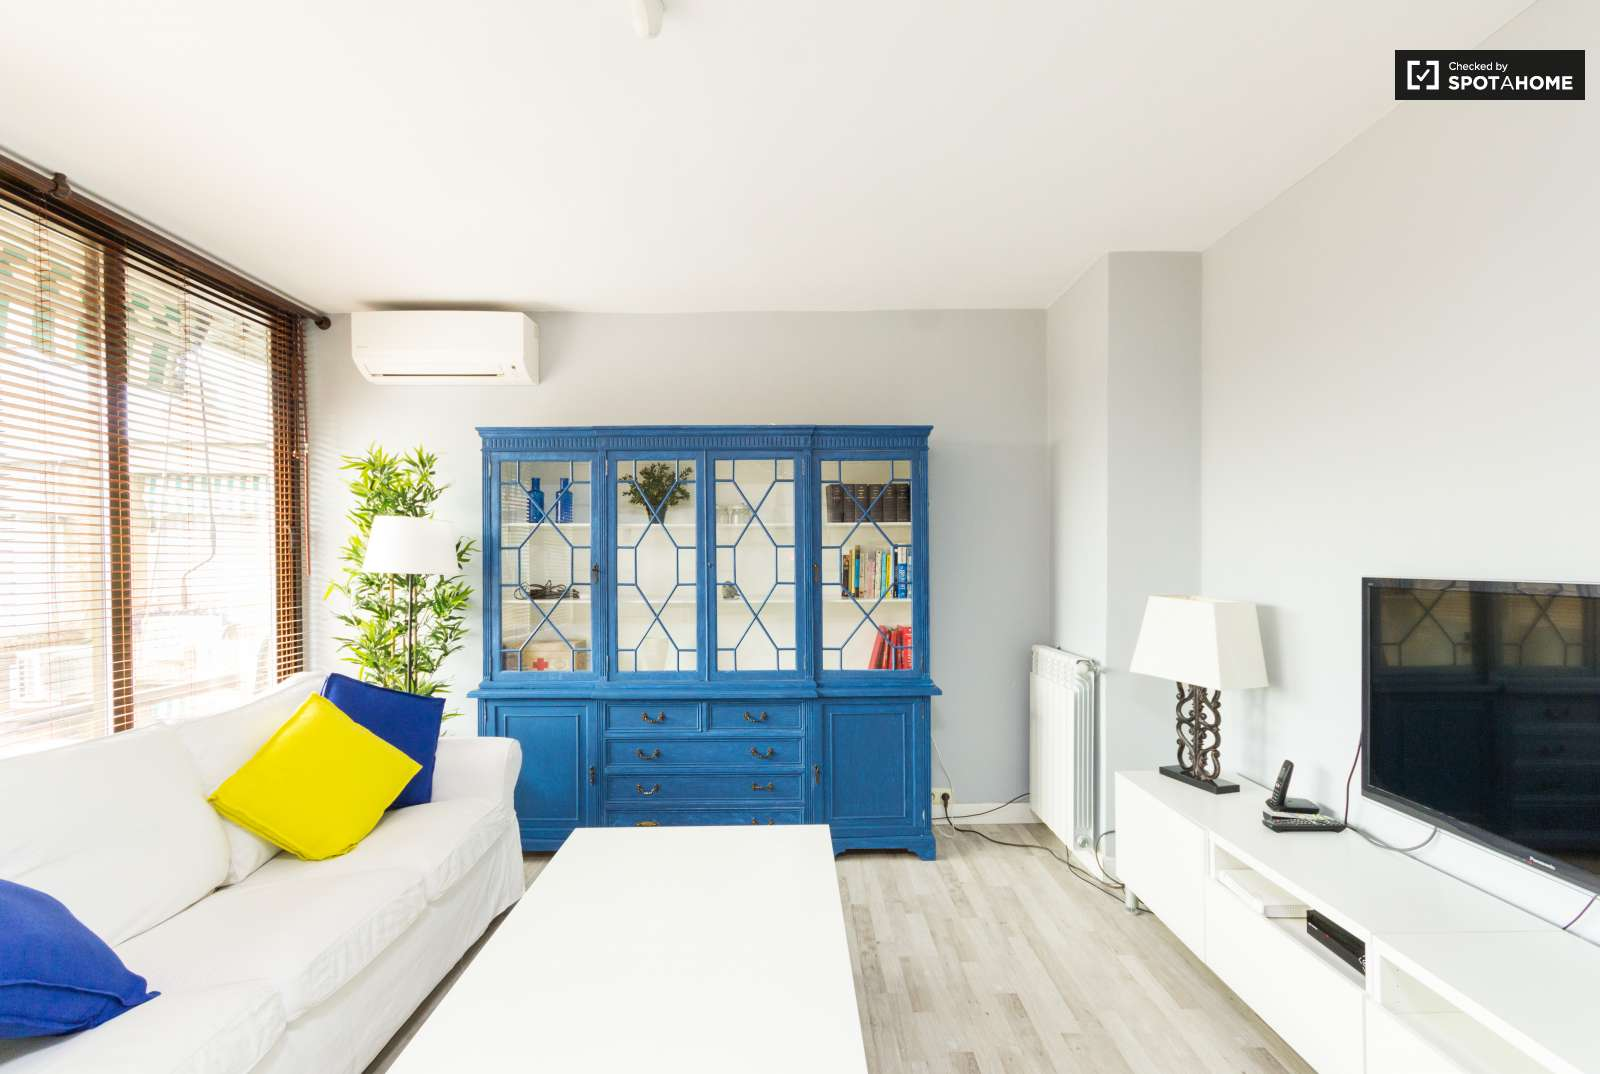 Piso de 1 habitaci n en alquiler con acceso a piscina - Pisos con piscina en madrid ...